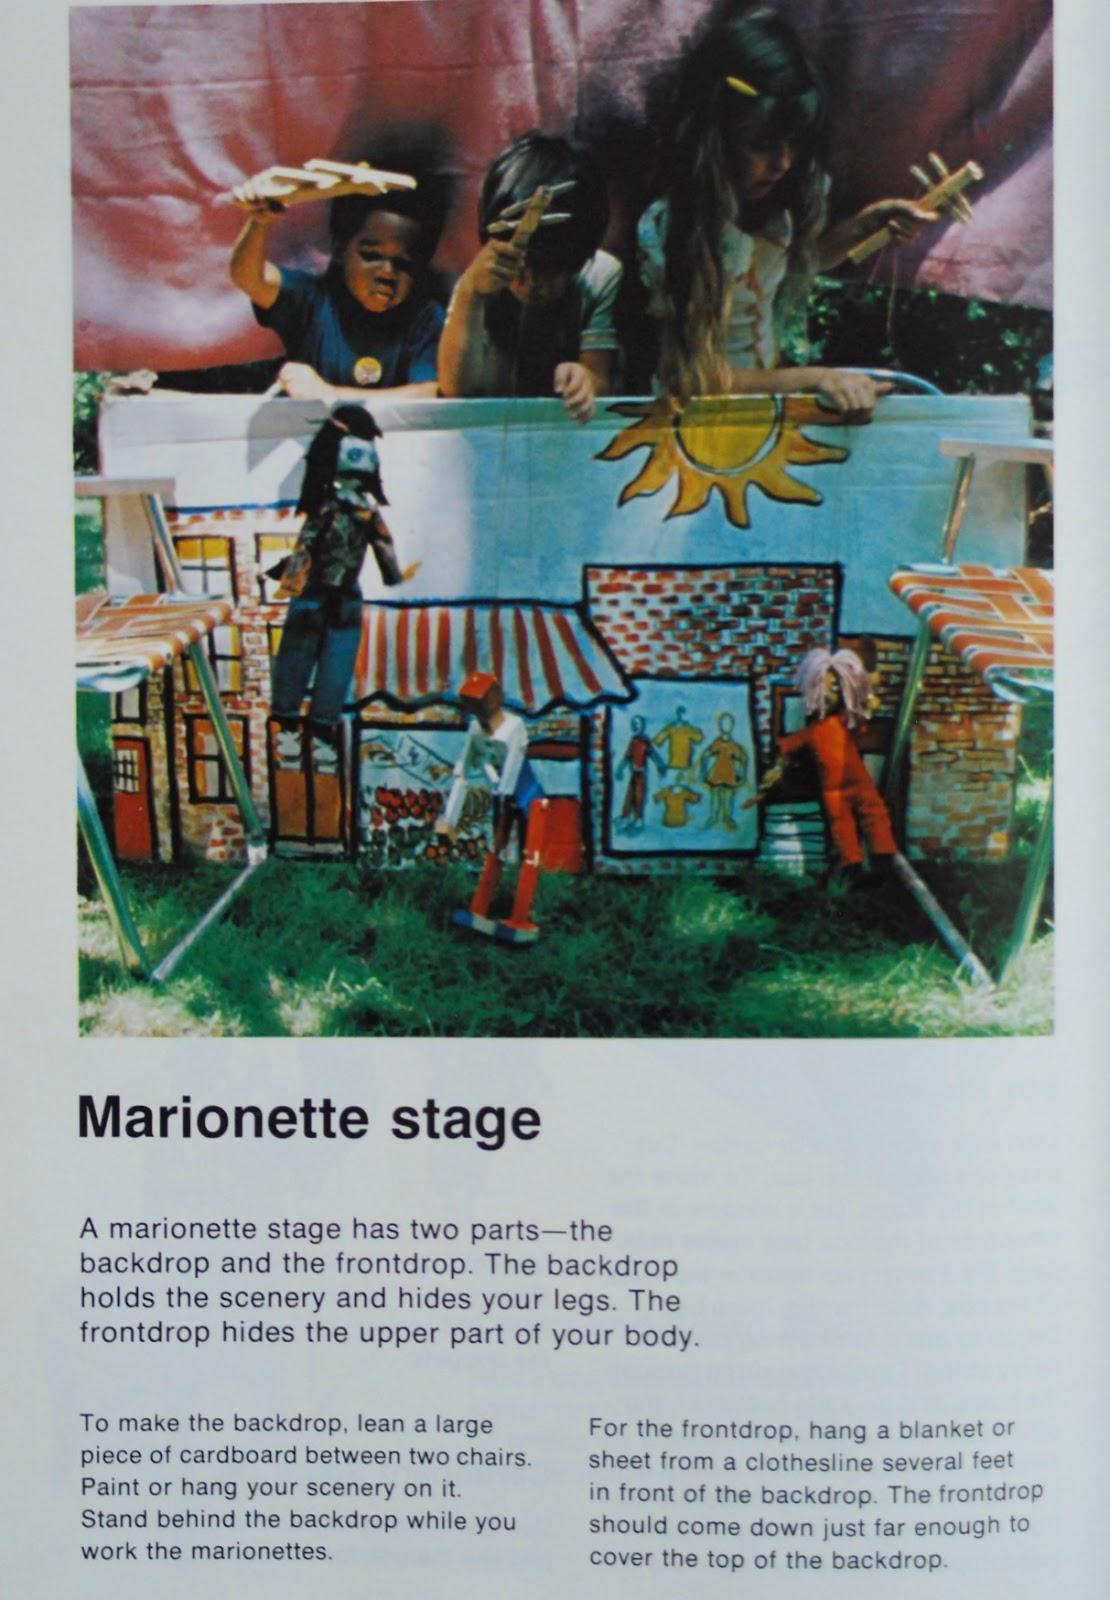 http://3.bp.blogspot.com/-QS4hViEc3XM/Tsm683_tcoI/AAAAAAAABSk/QB1ipxhkvac/s1600/make+and+do+childcraft+marionette+stage.jpg